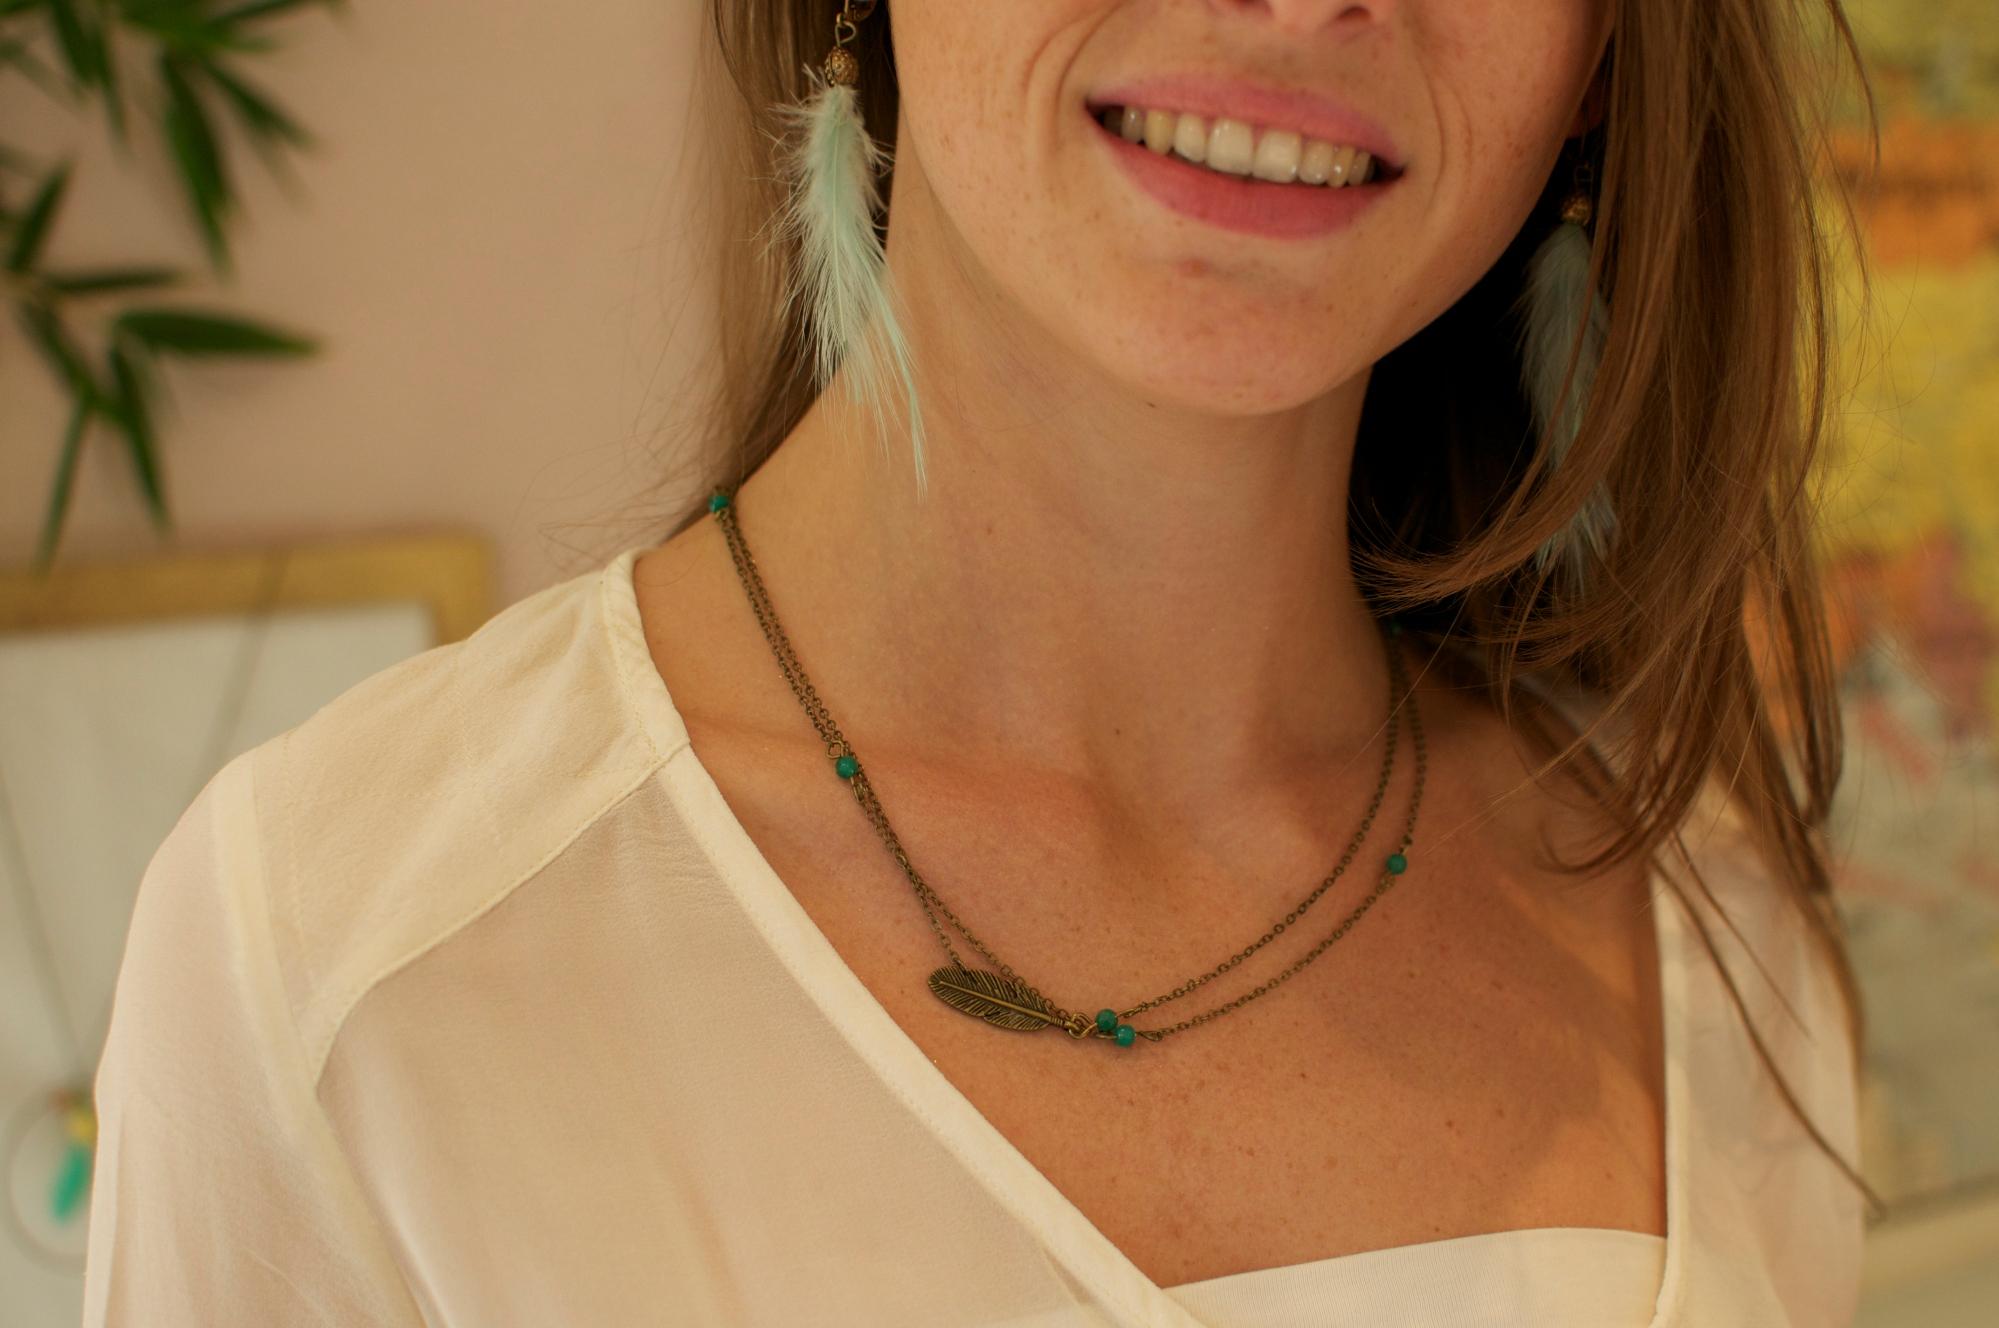 Collier court plume laiton perle vert fin léger